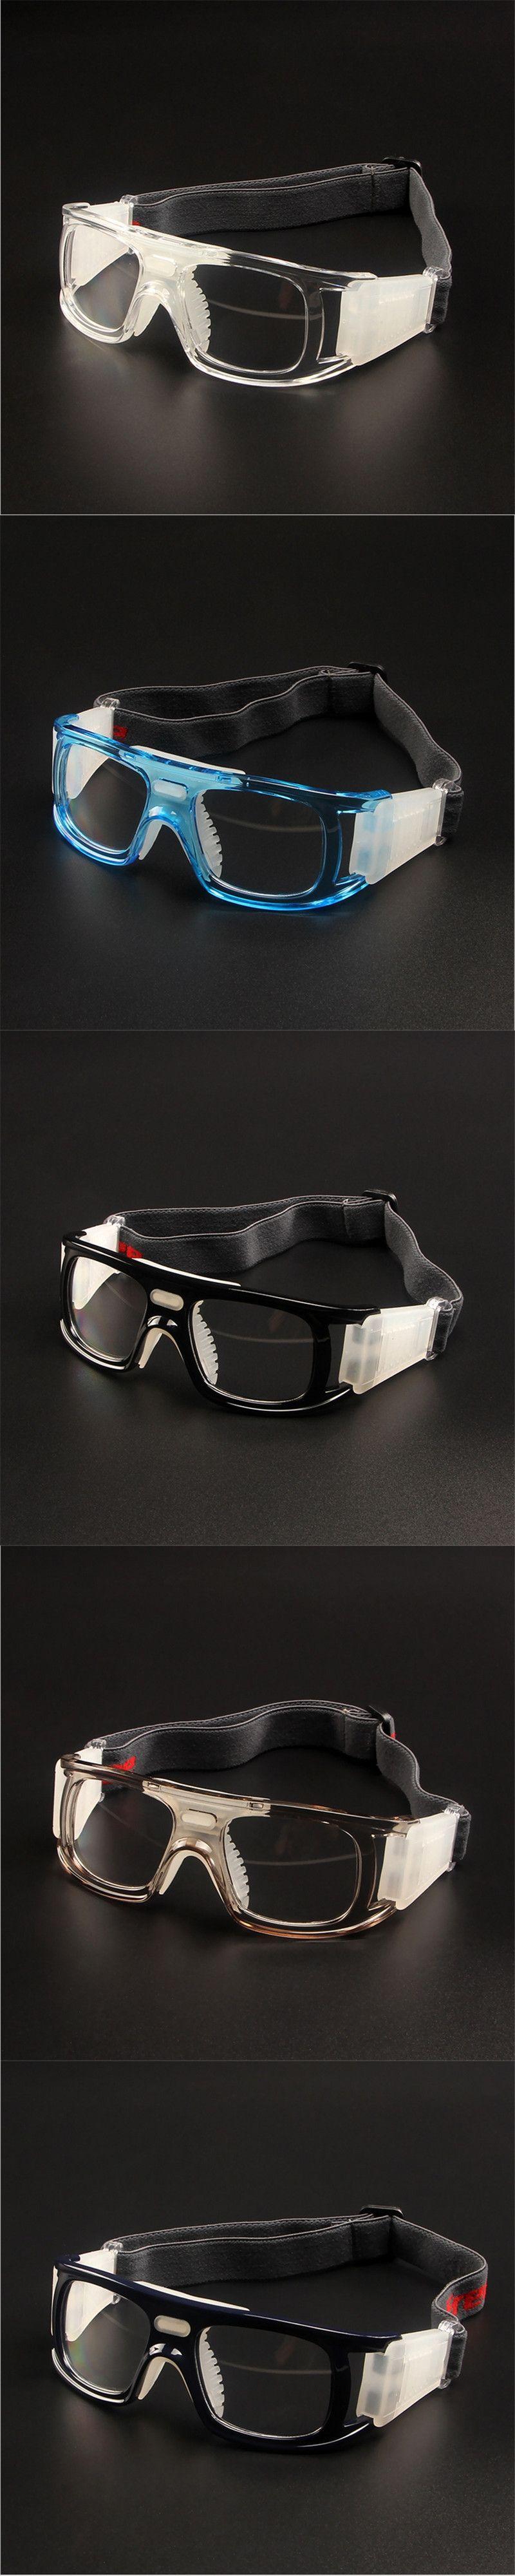 694b6779b812 Sports glasses Basketball glasses Prescription glass frame football  Protective eye Outdoor custom optical frame dx016